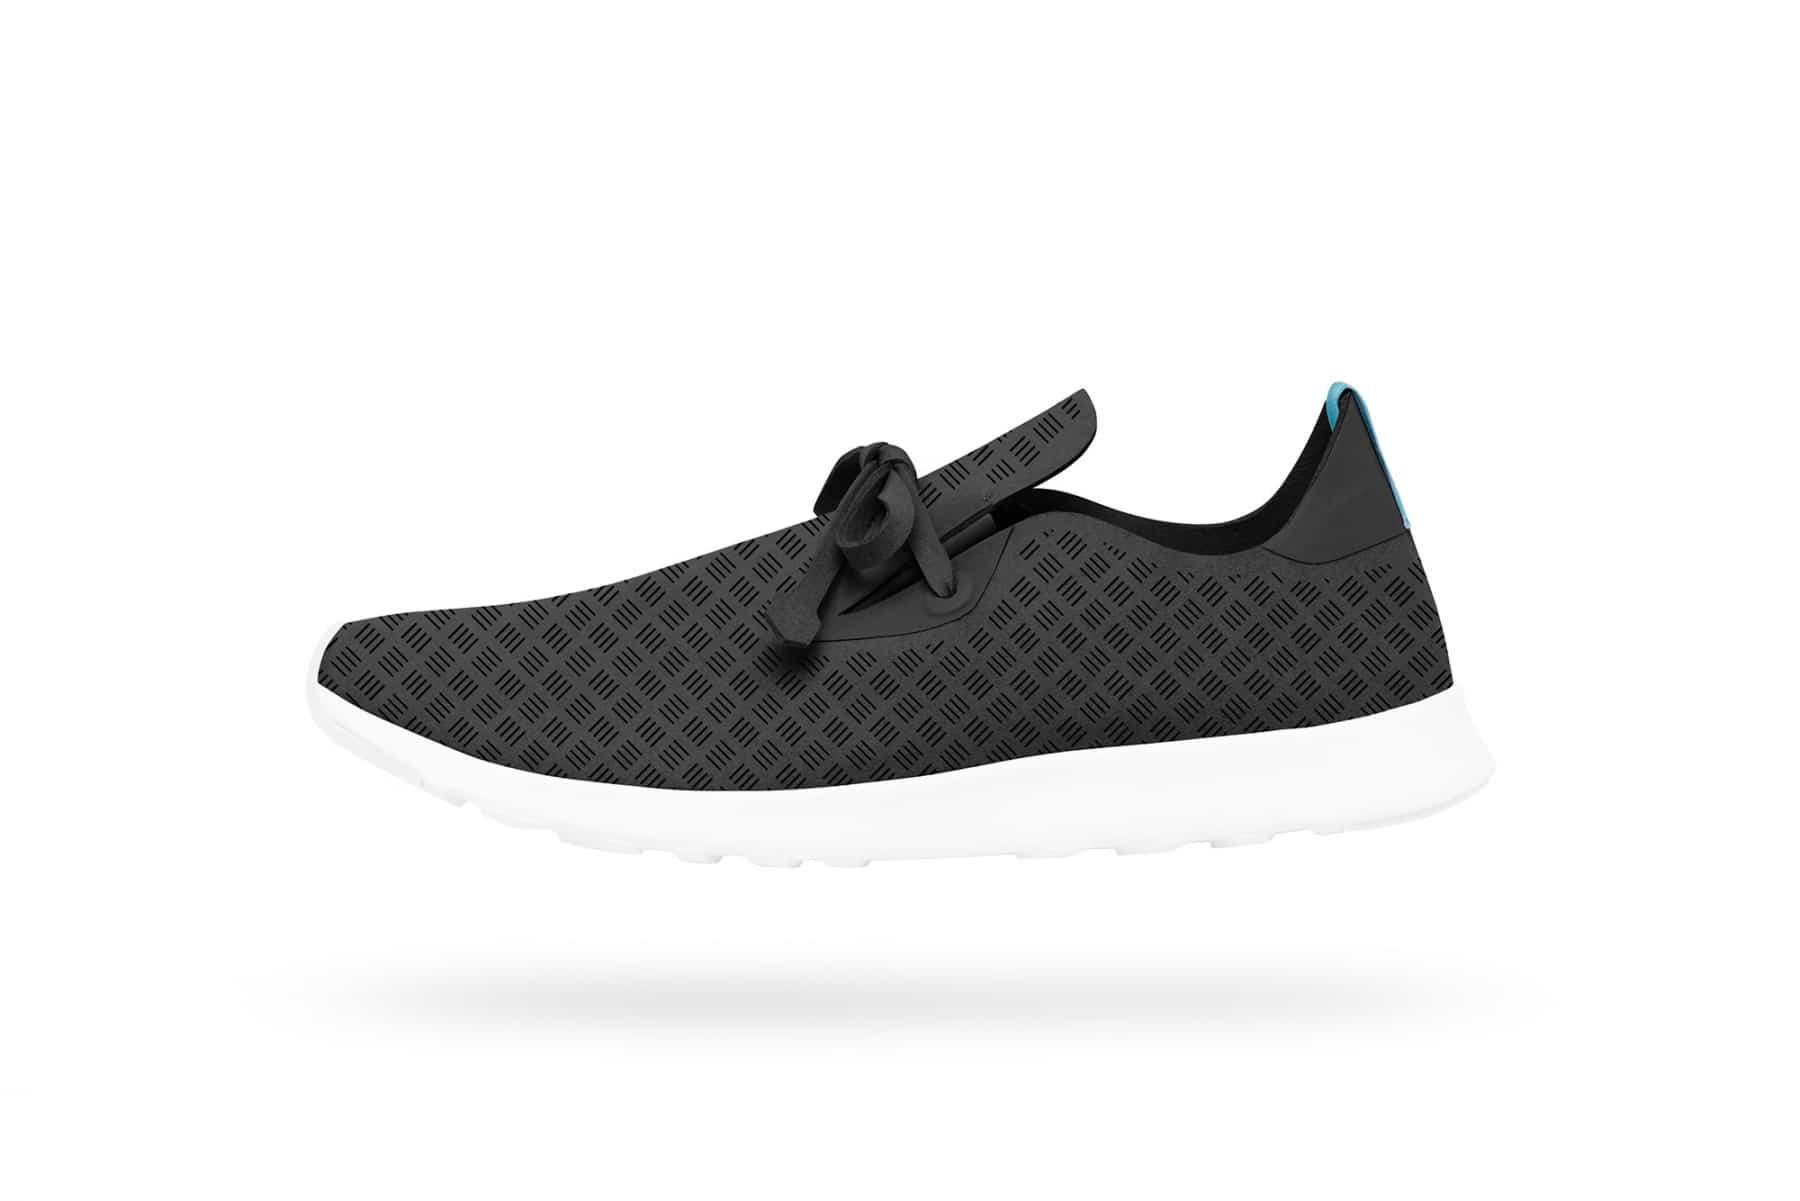 native apollo kicks shoe white sole